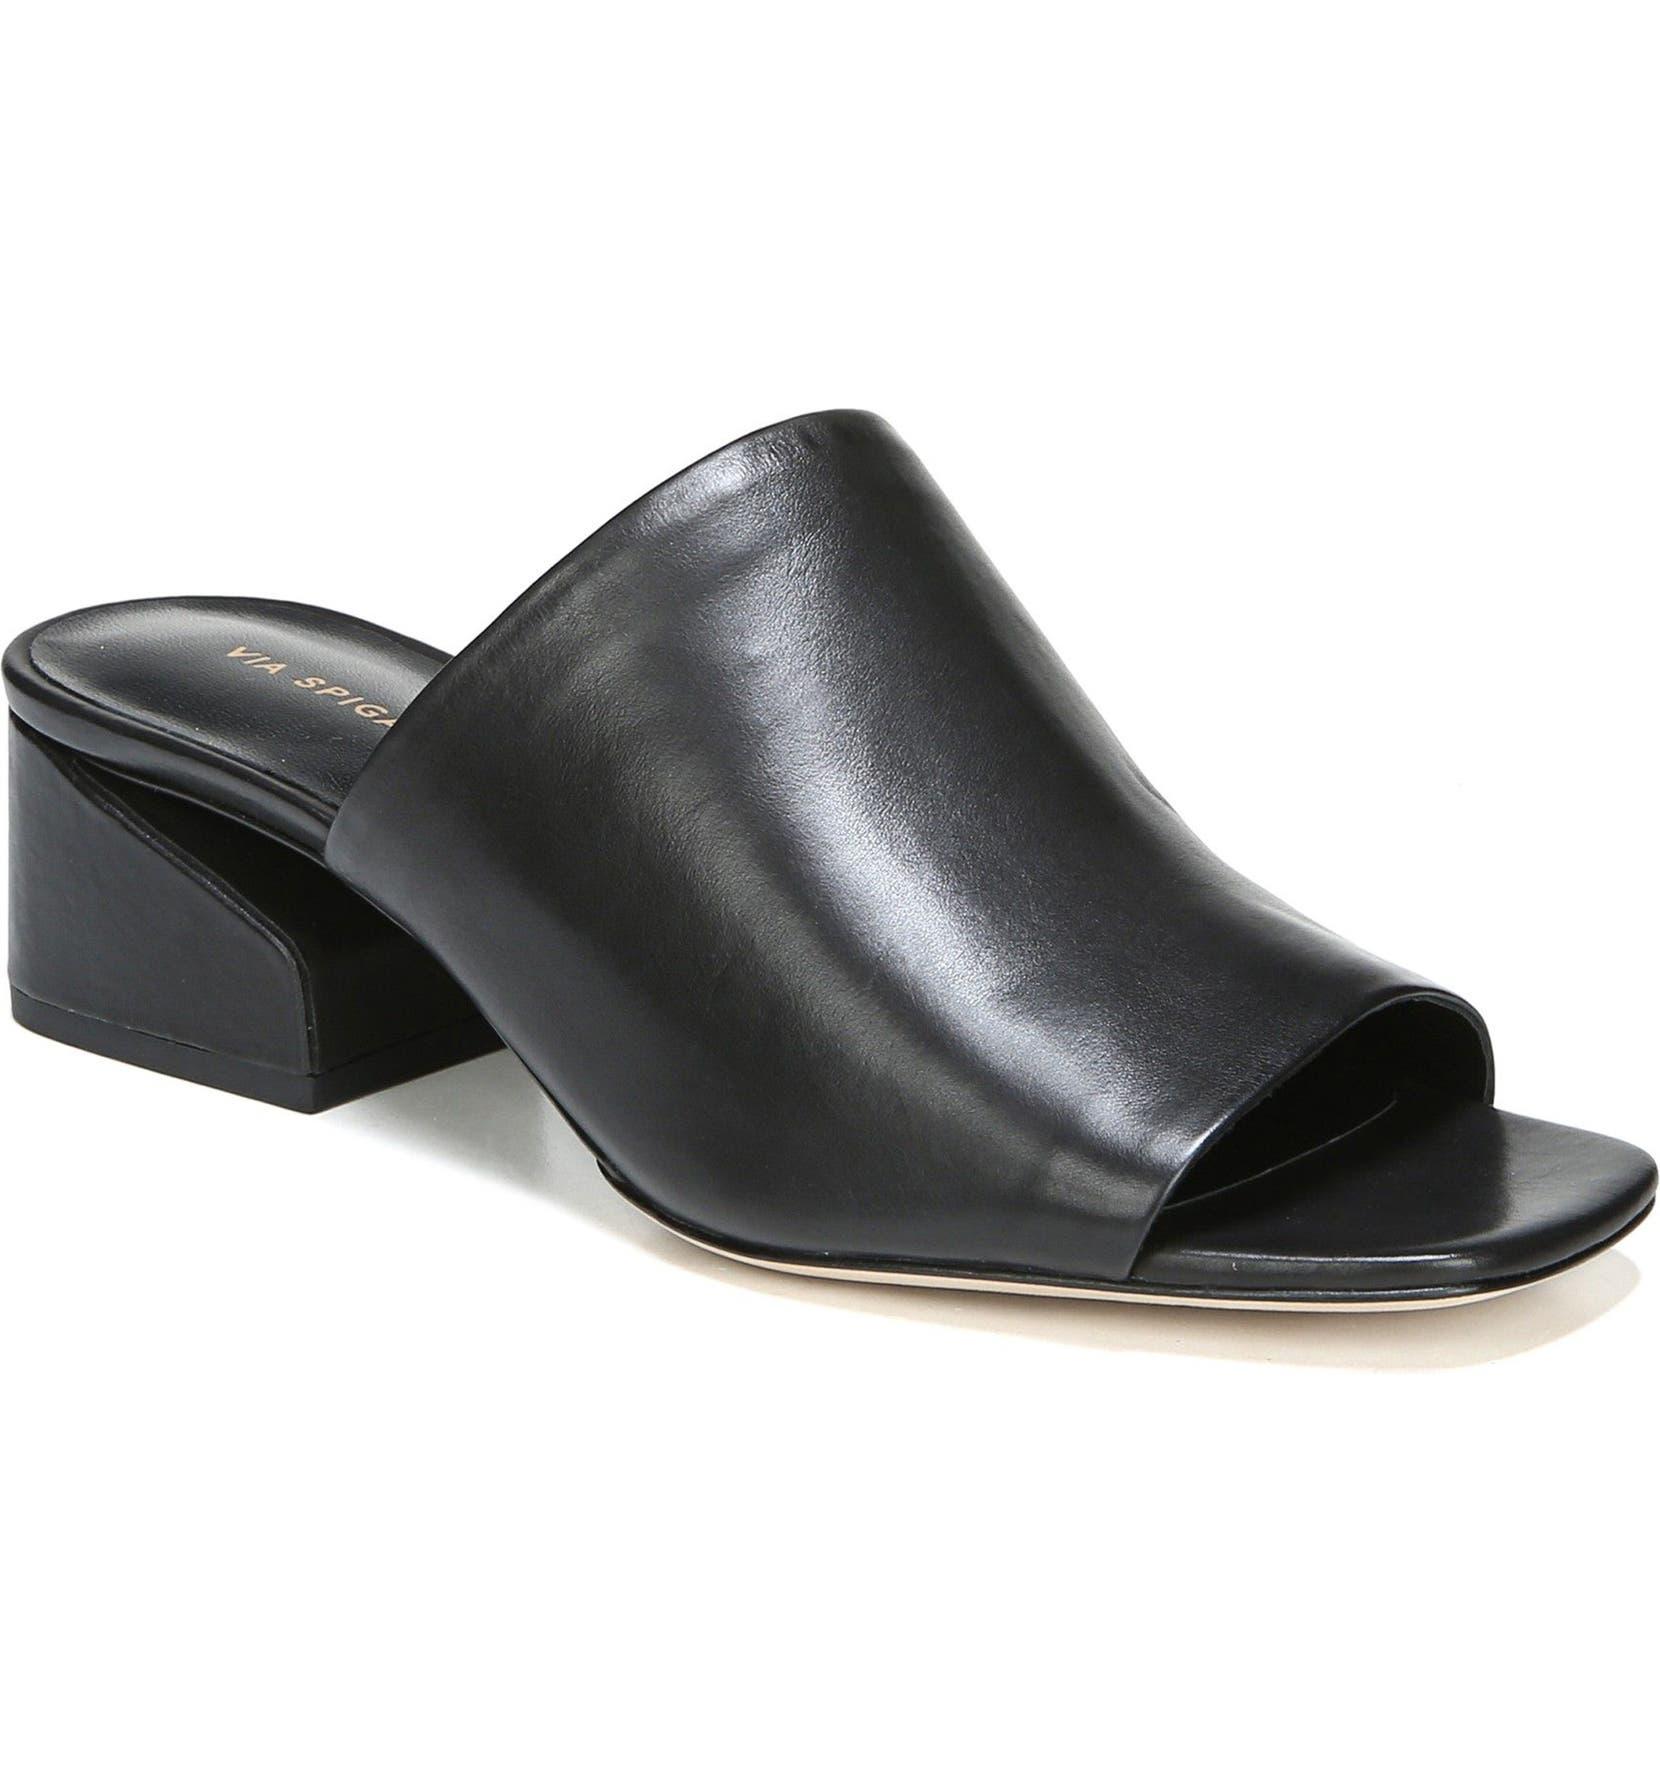 00c43b16e317 Via Spiga Porter Peep Toe Mule (Women)